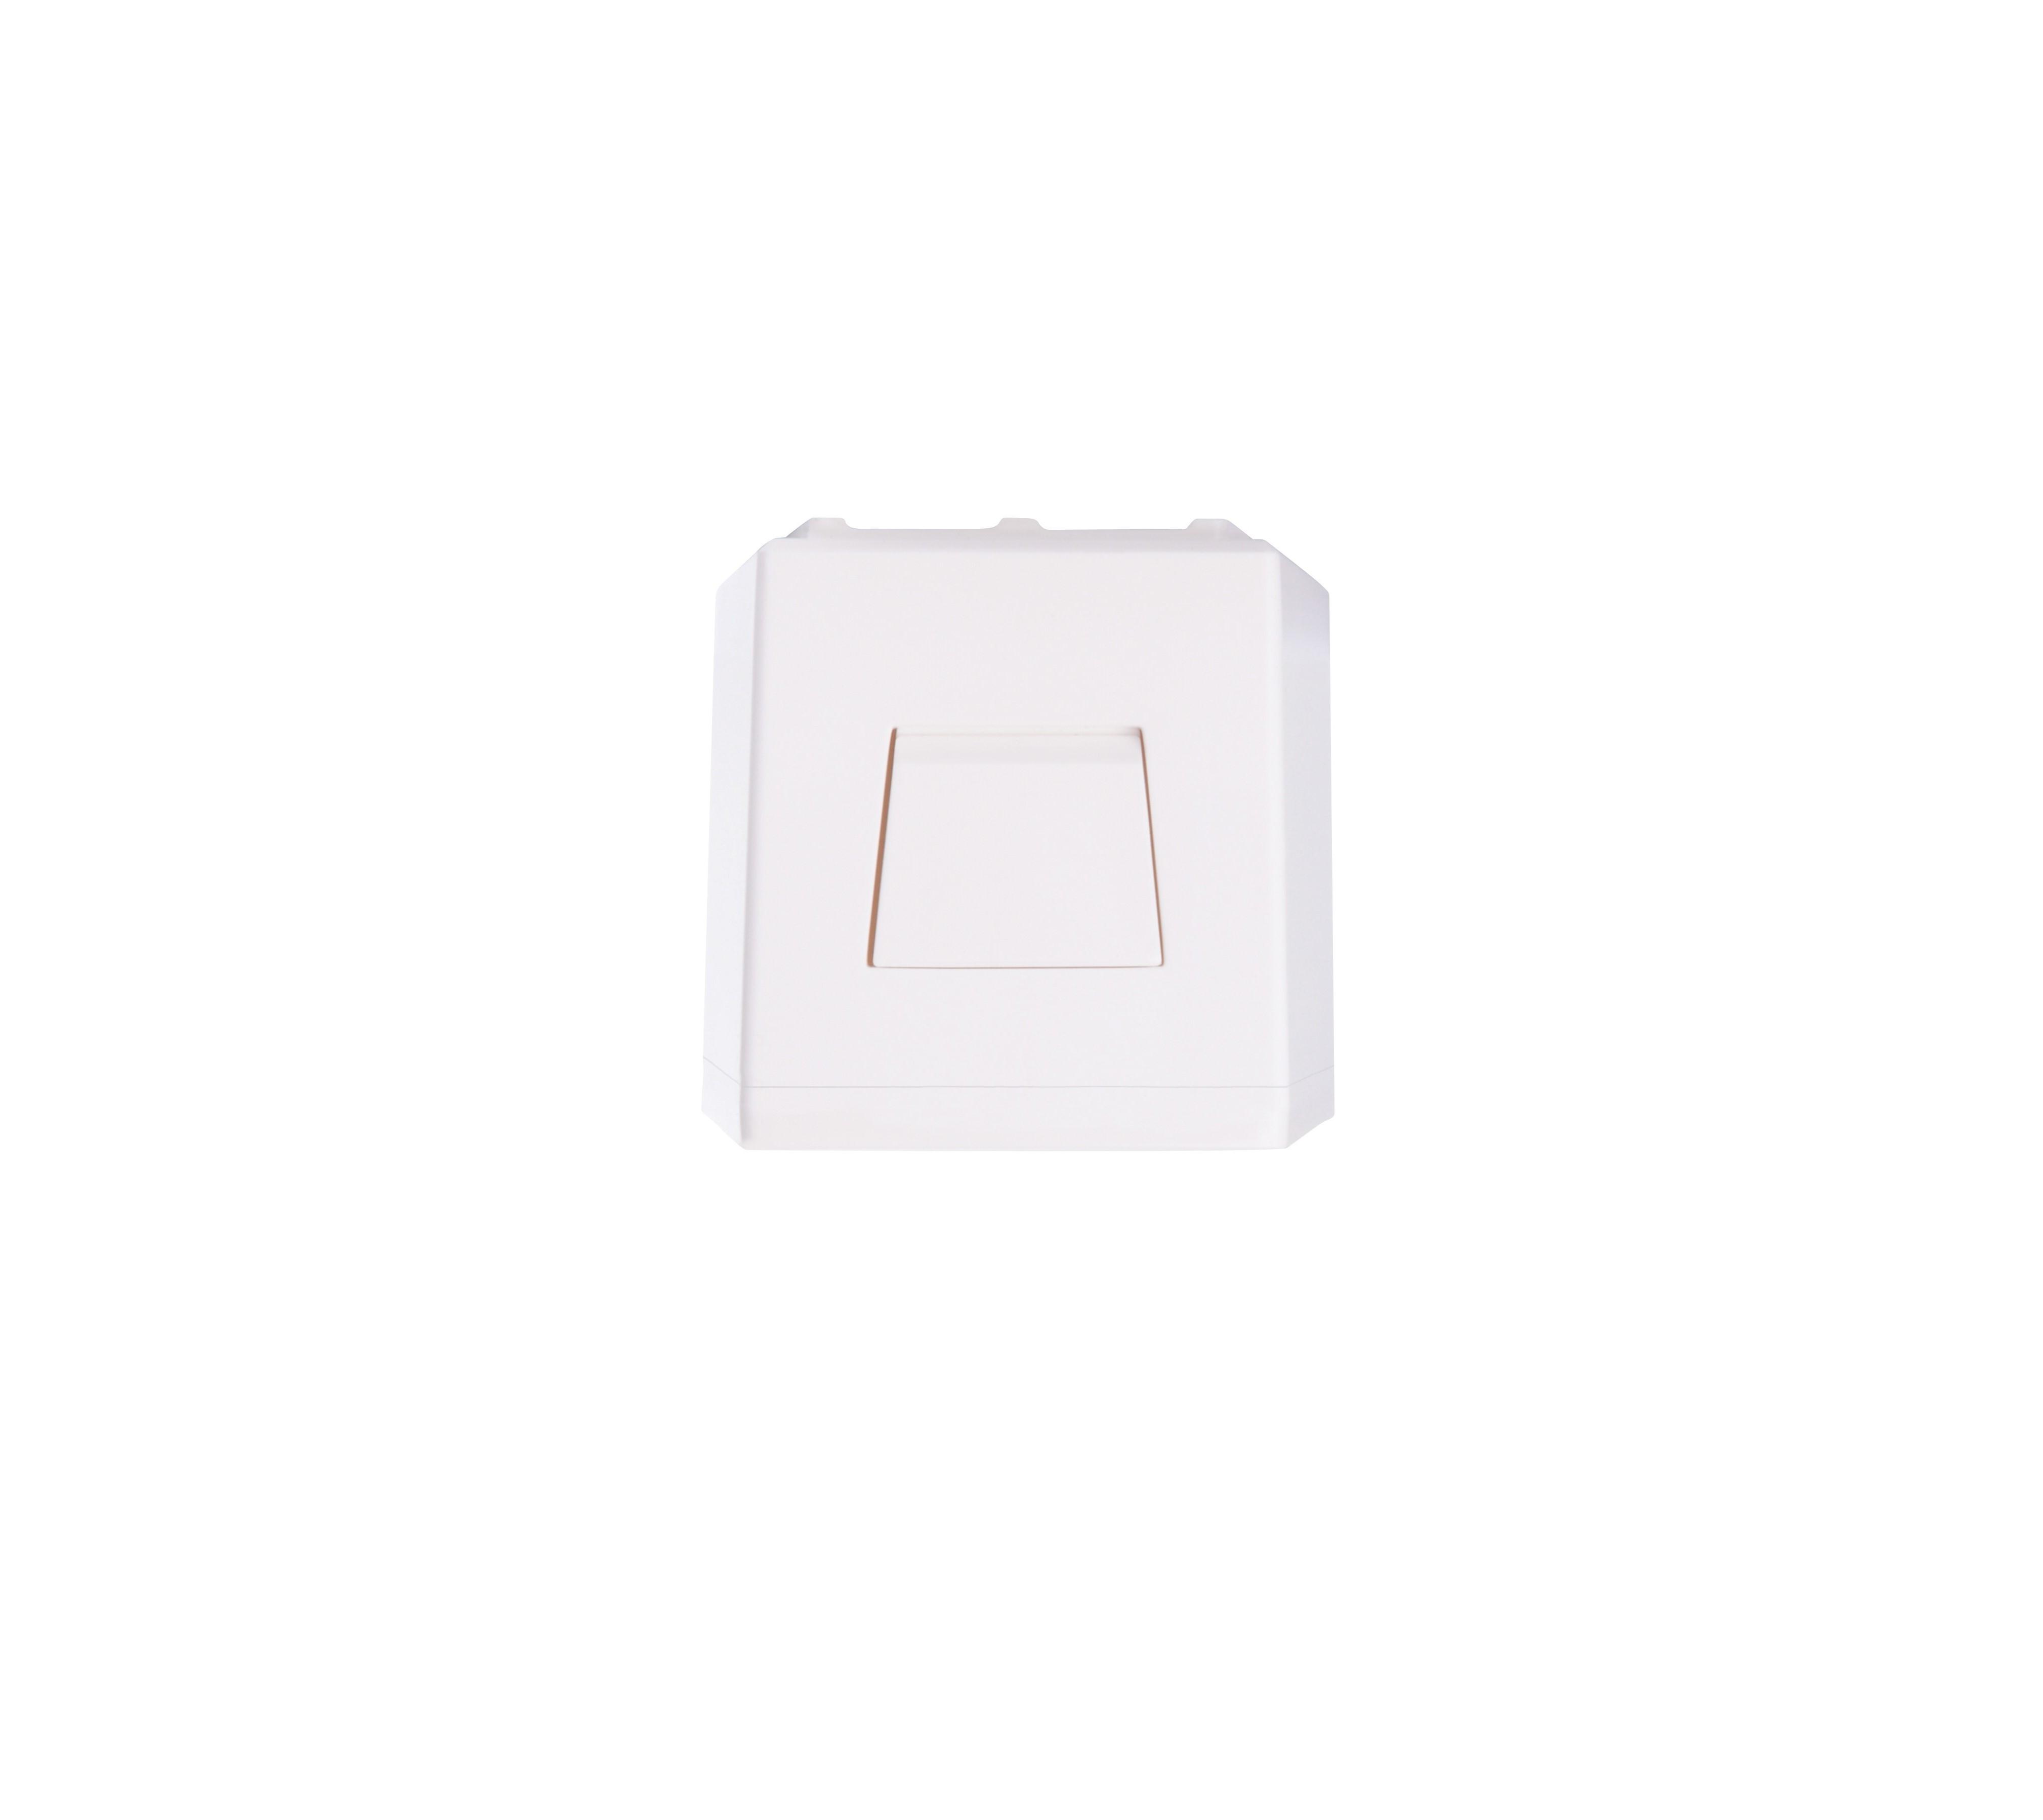 Lampa emergenta led Intelight 94764   3h mentinut test automat 1